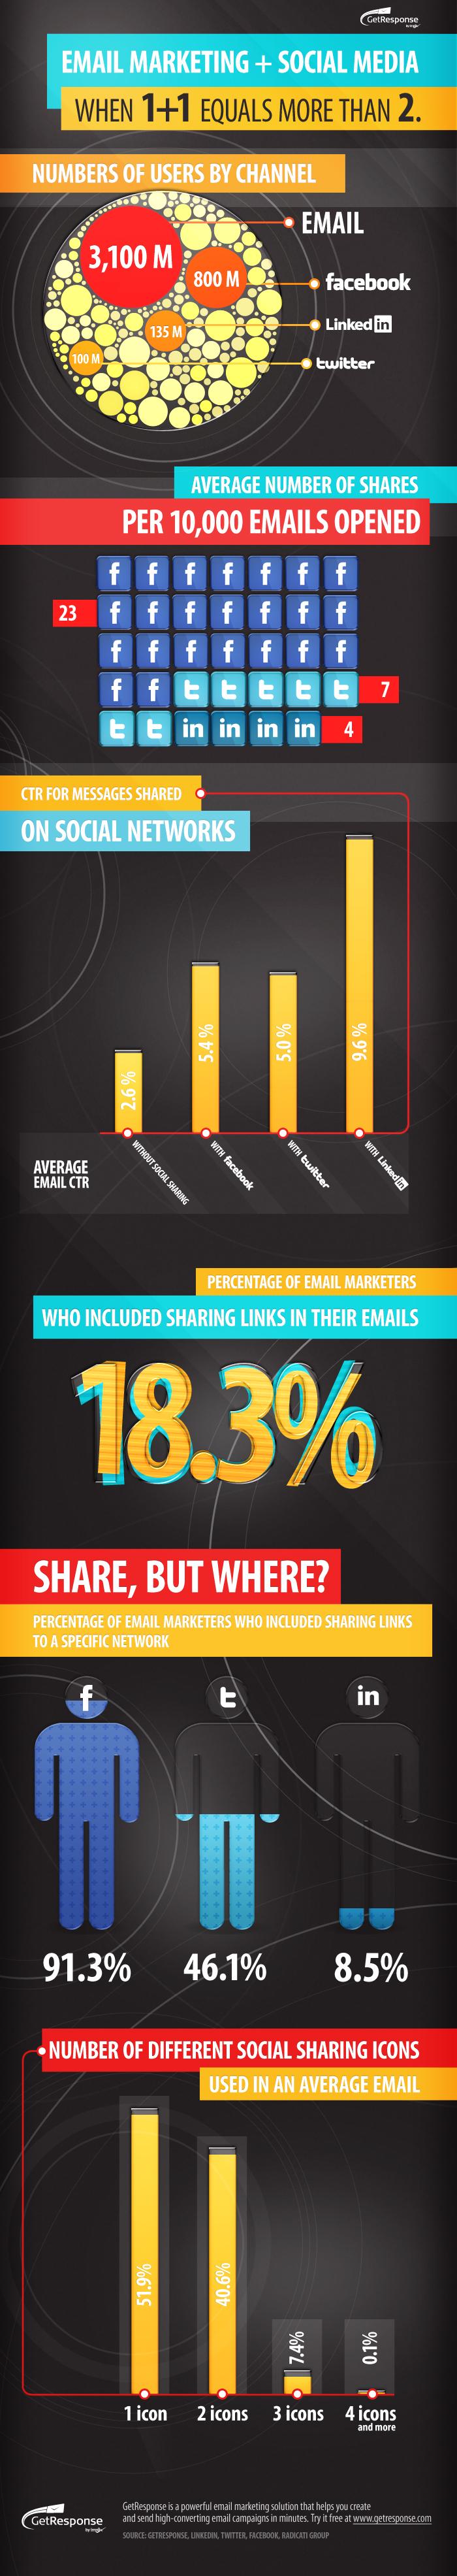 Infographic_email_marketing_socialmedia_61